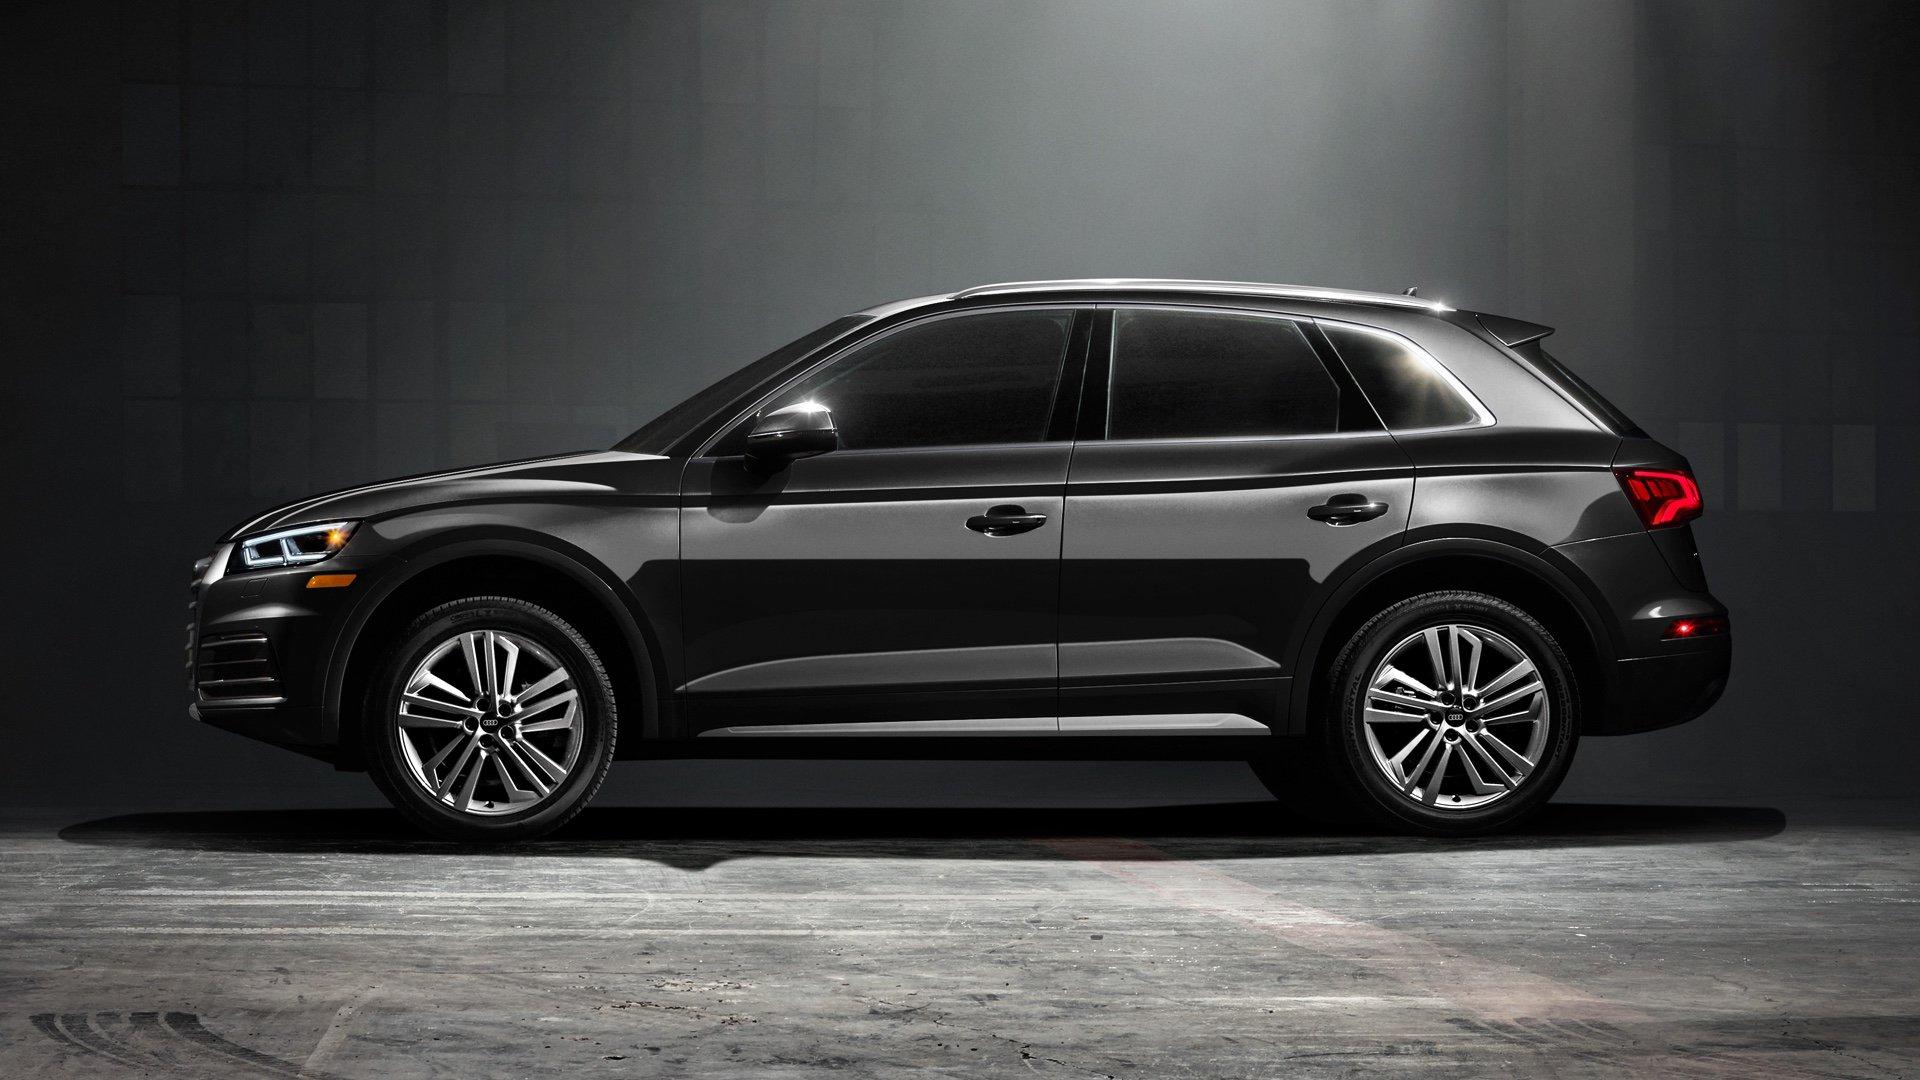 Audi Q Financing In Austin TX Aston Martin Of Austin - Q5 audi